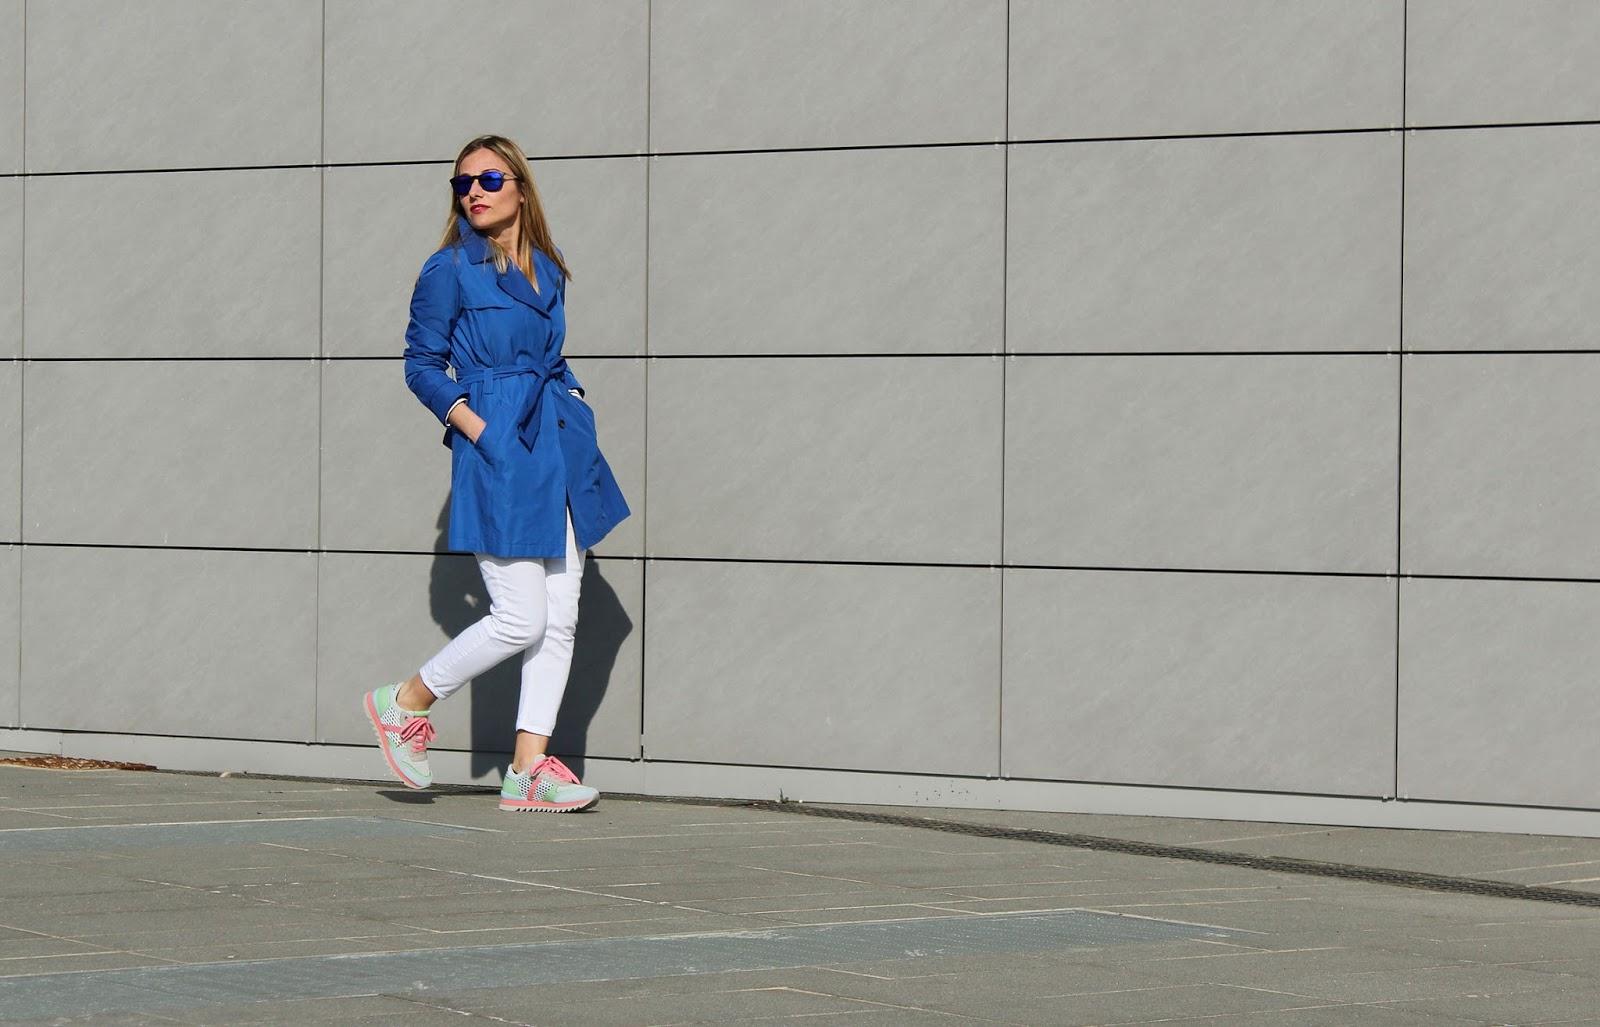 Eniwhere Fashion - Apepazza sneakers